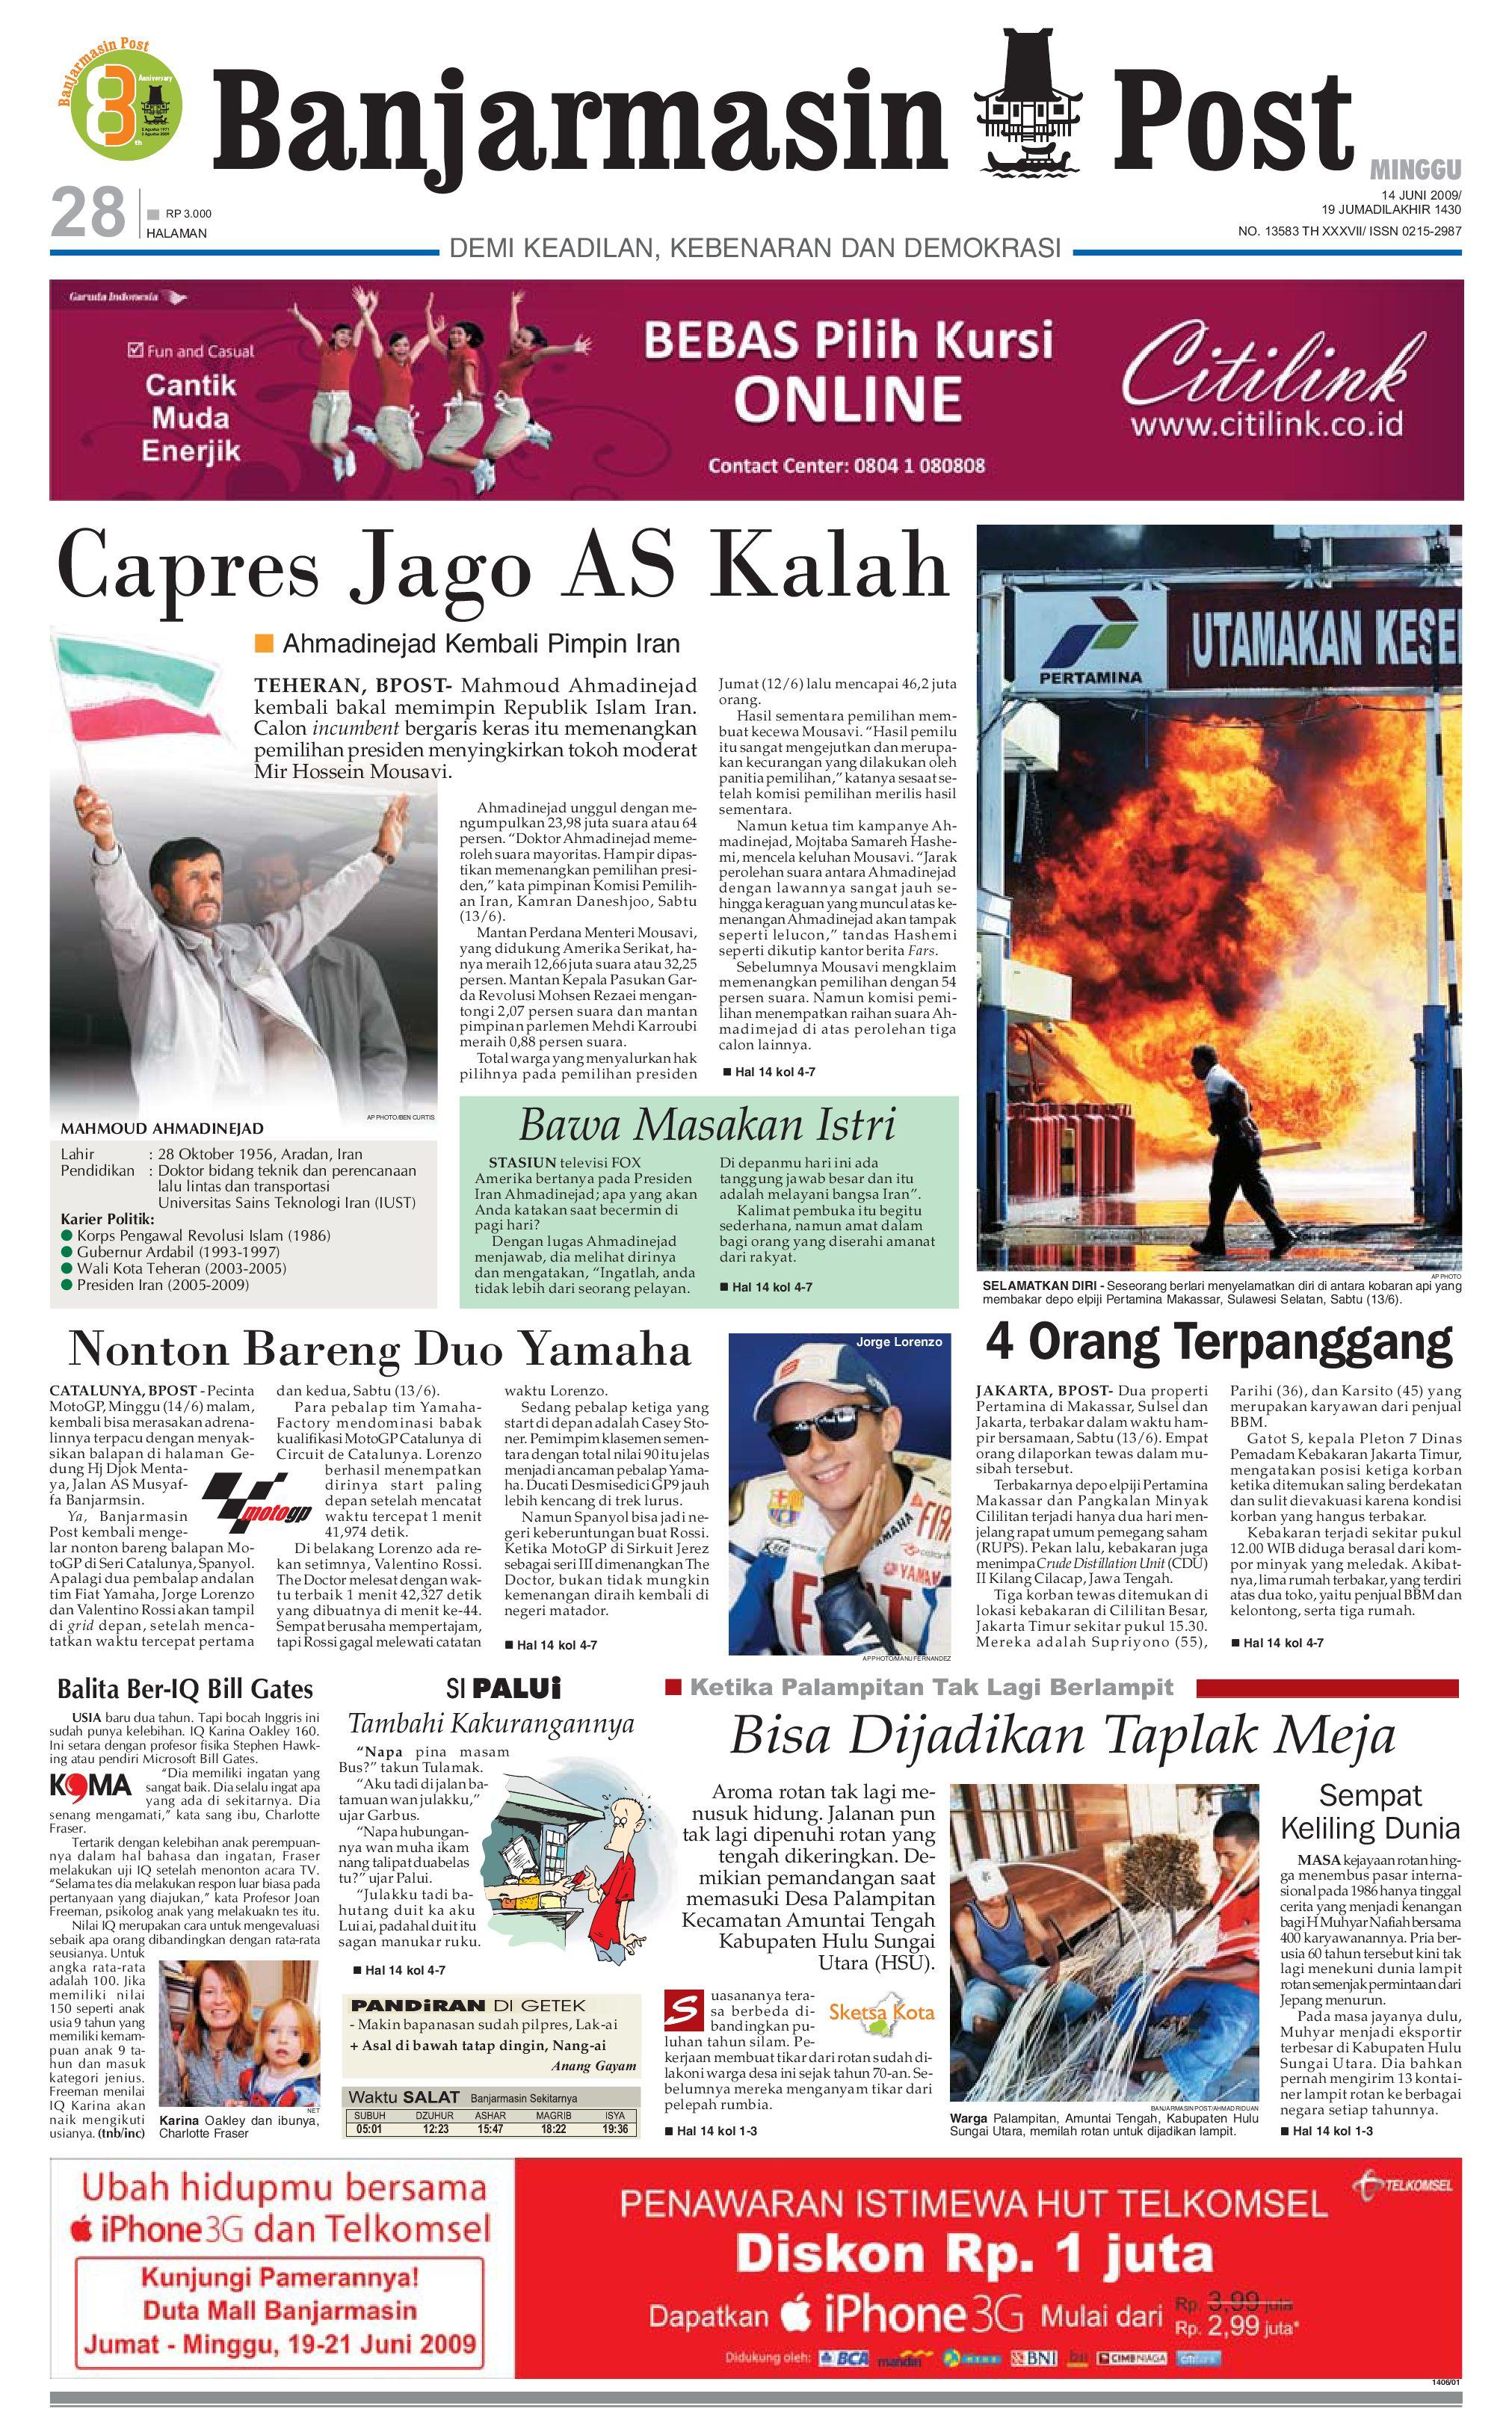 Banjarmasin Post Edisi Minggu 14 Juni 2009 By Tcash Vaganza 17 Botol Minum Olahraga Discovery 750ml Hitam Issuu